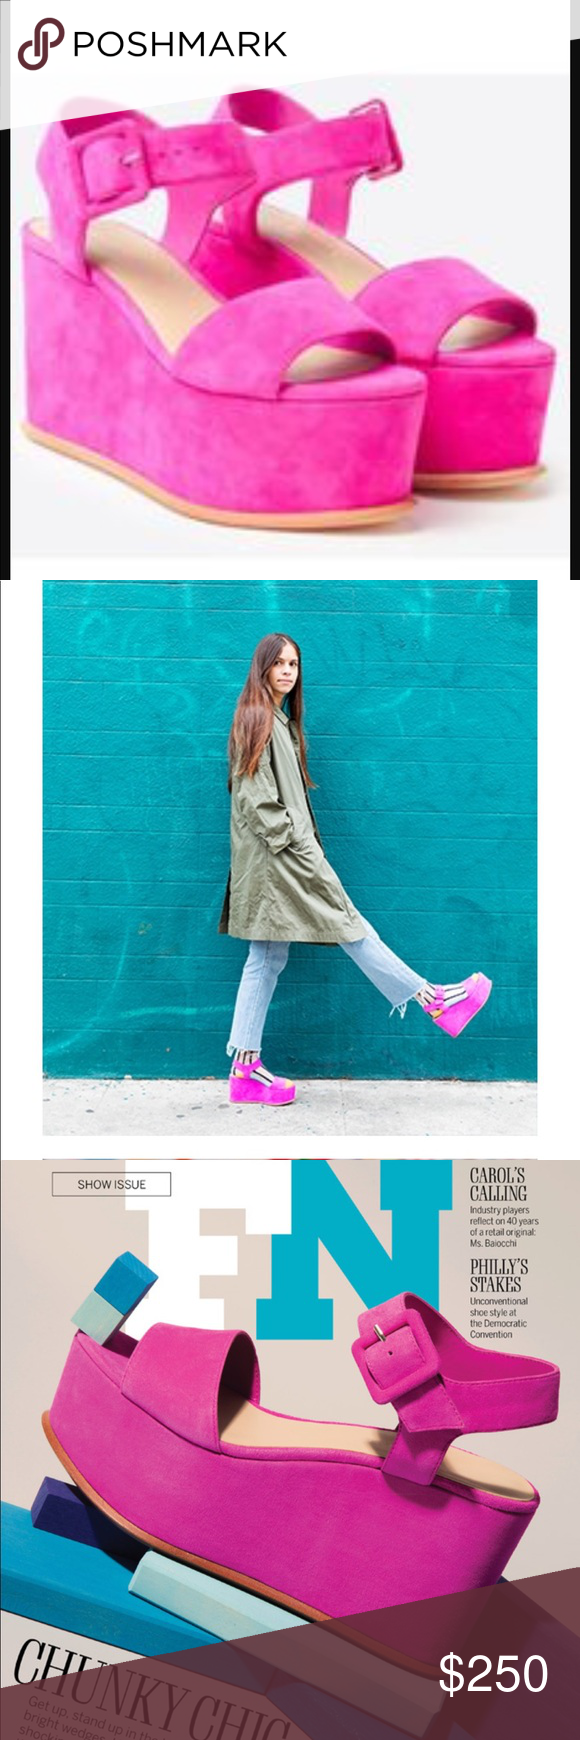 fde19a1d865f Loeffler Randall Alessa Platform Sandals GORGEOUS platform sandals in a  bright pink. Worn once you